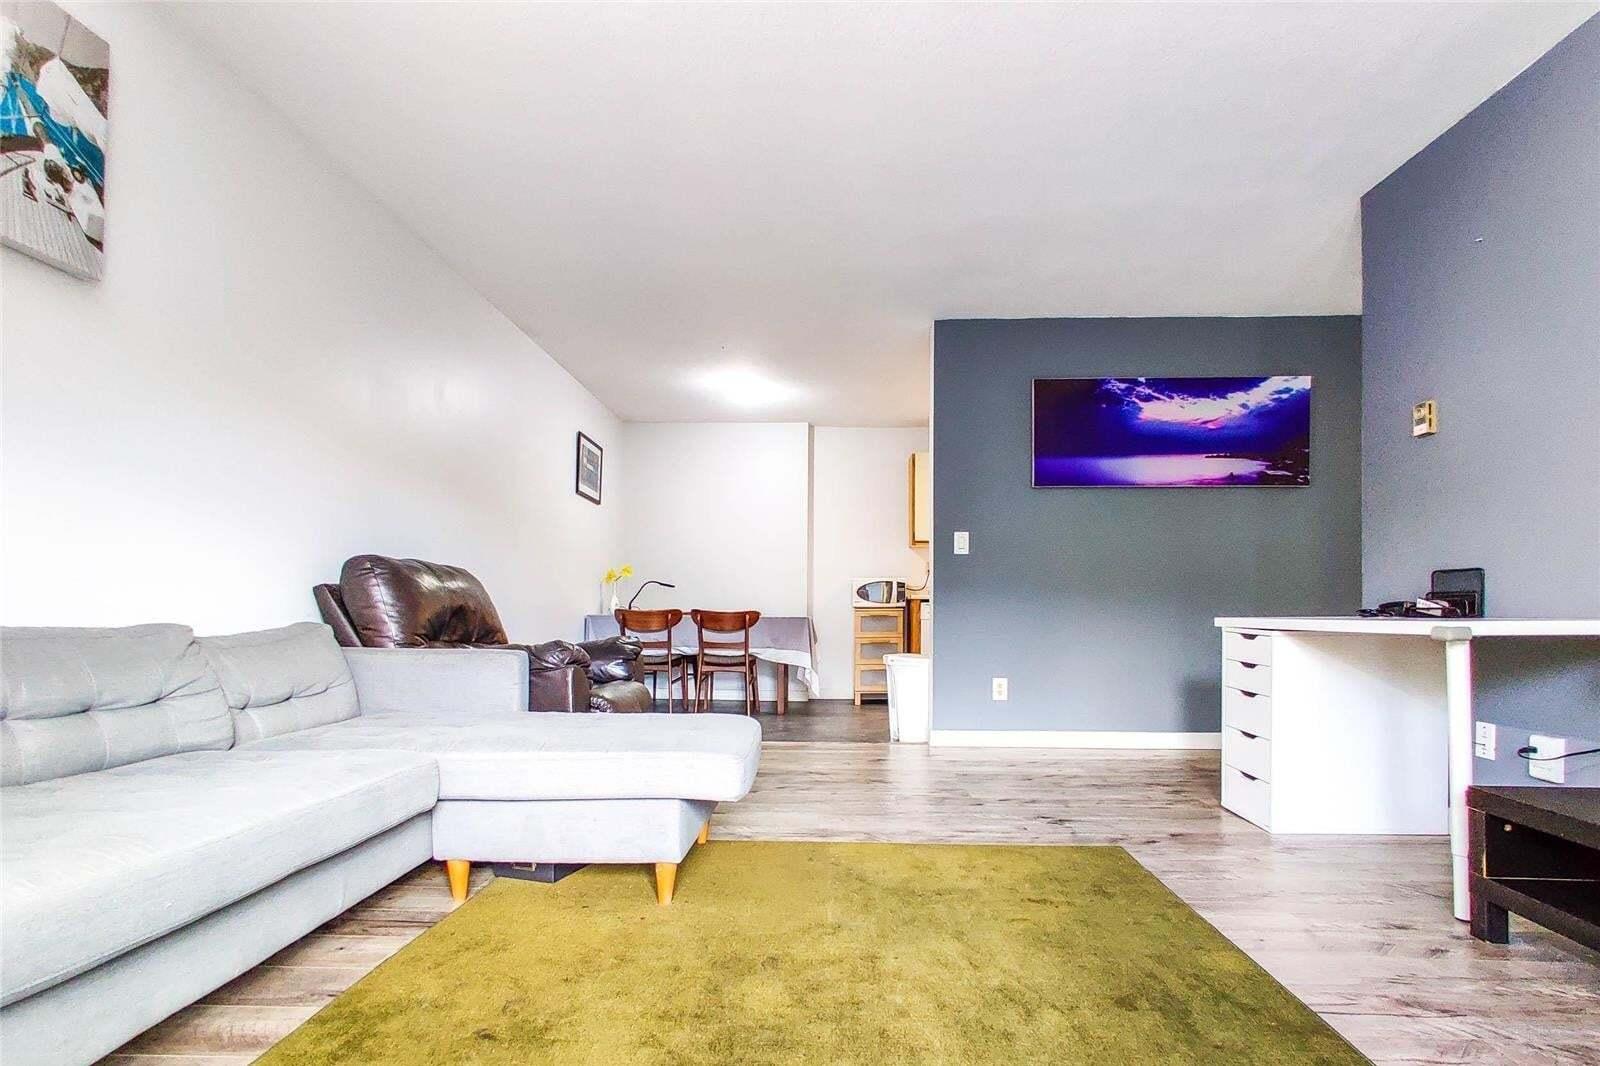 Condo for sale at 3160 De Montreuil Ct Unit 211 Kelowna British Columbia - MLS: 10216905